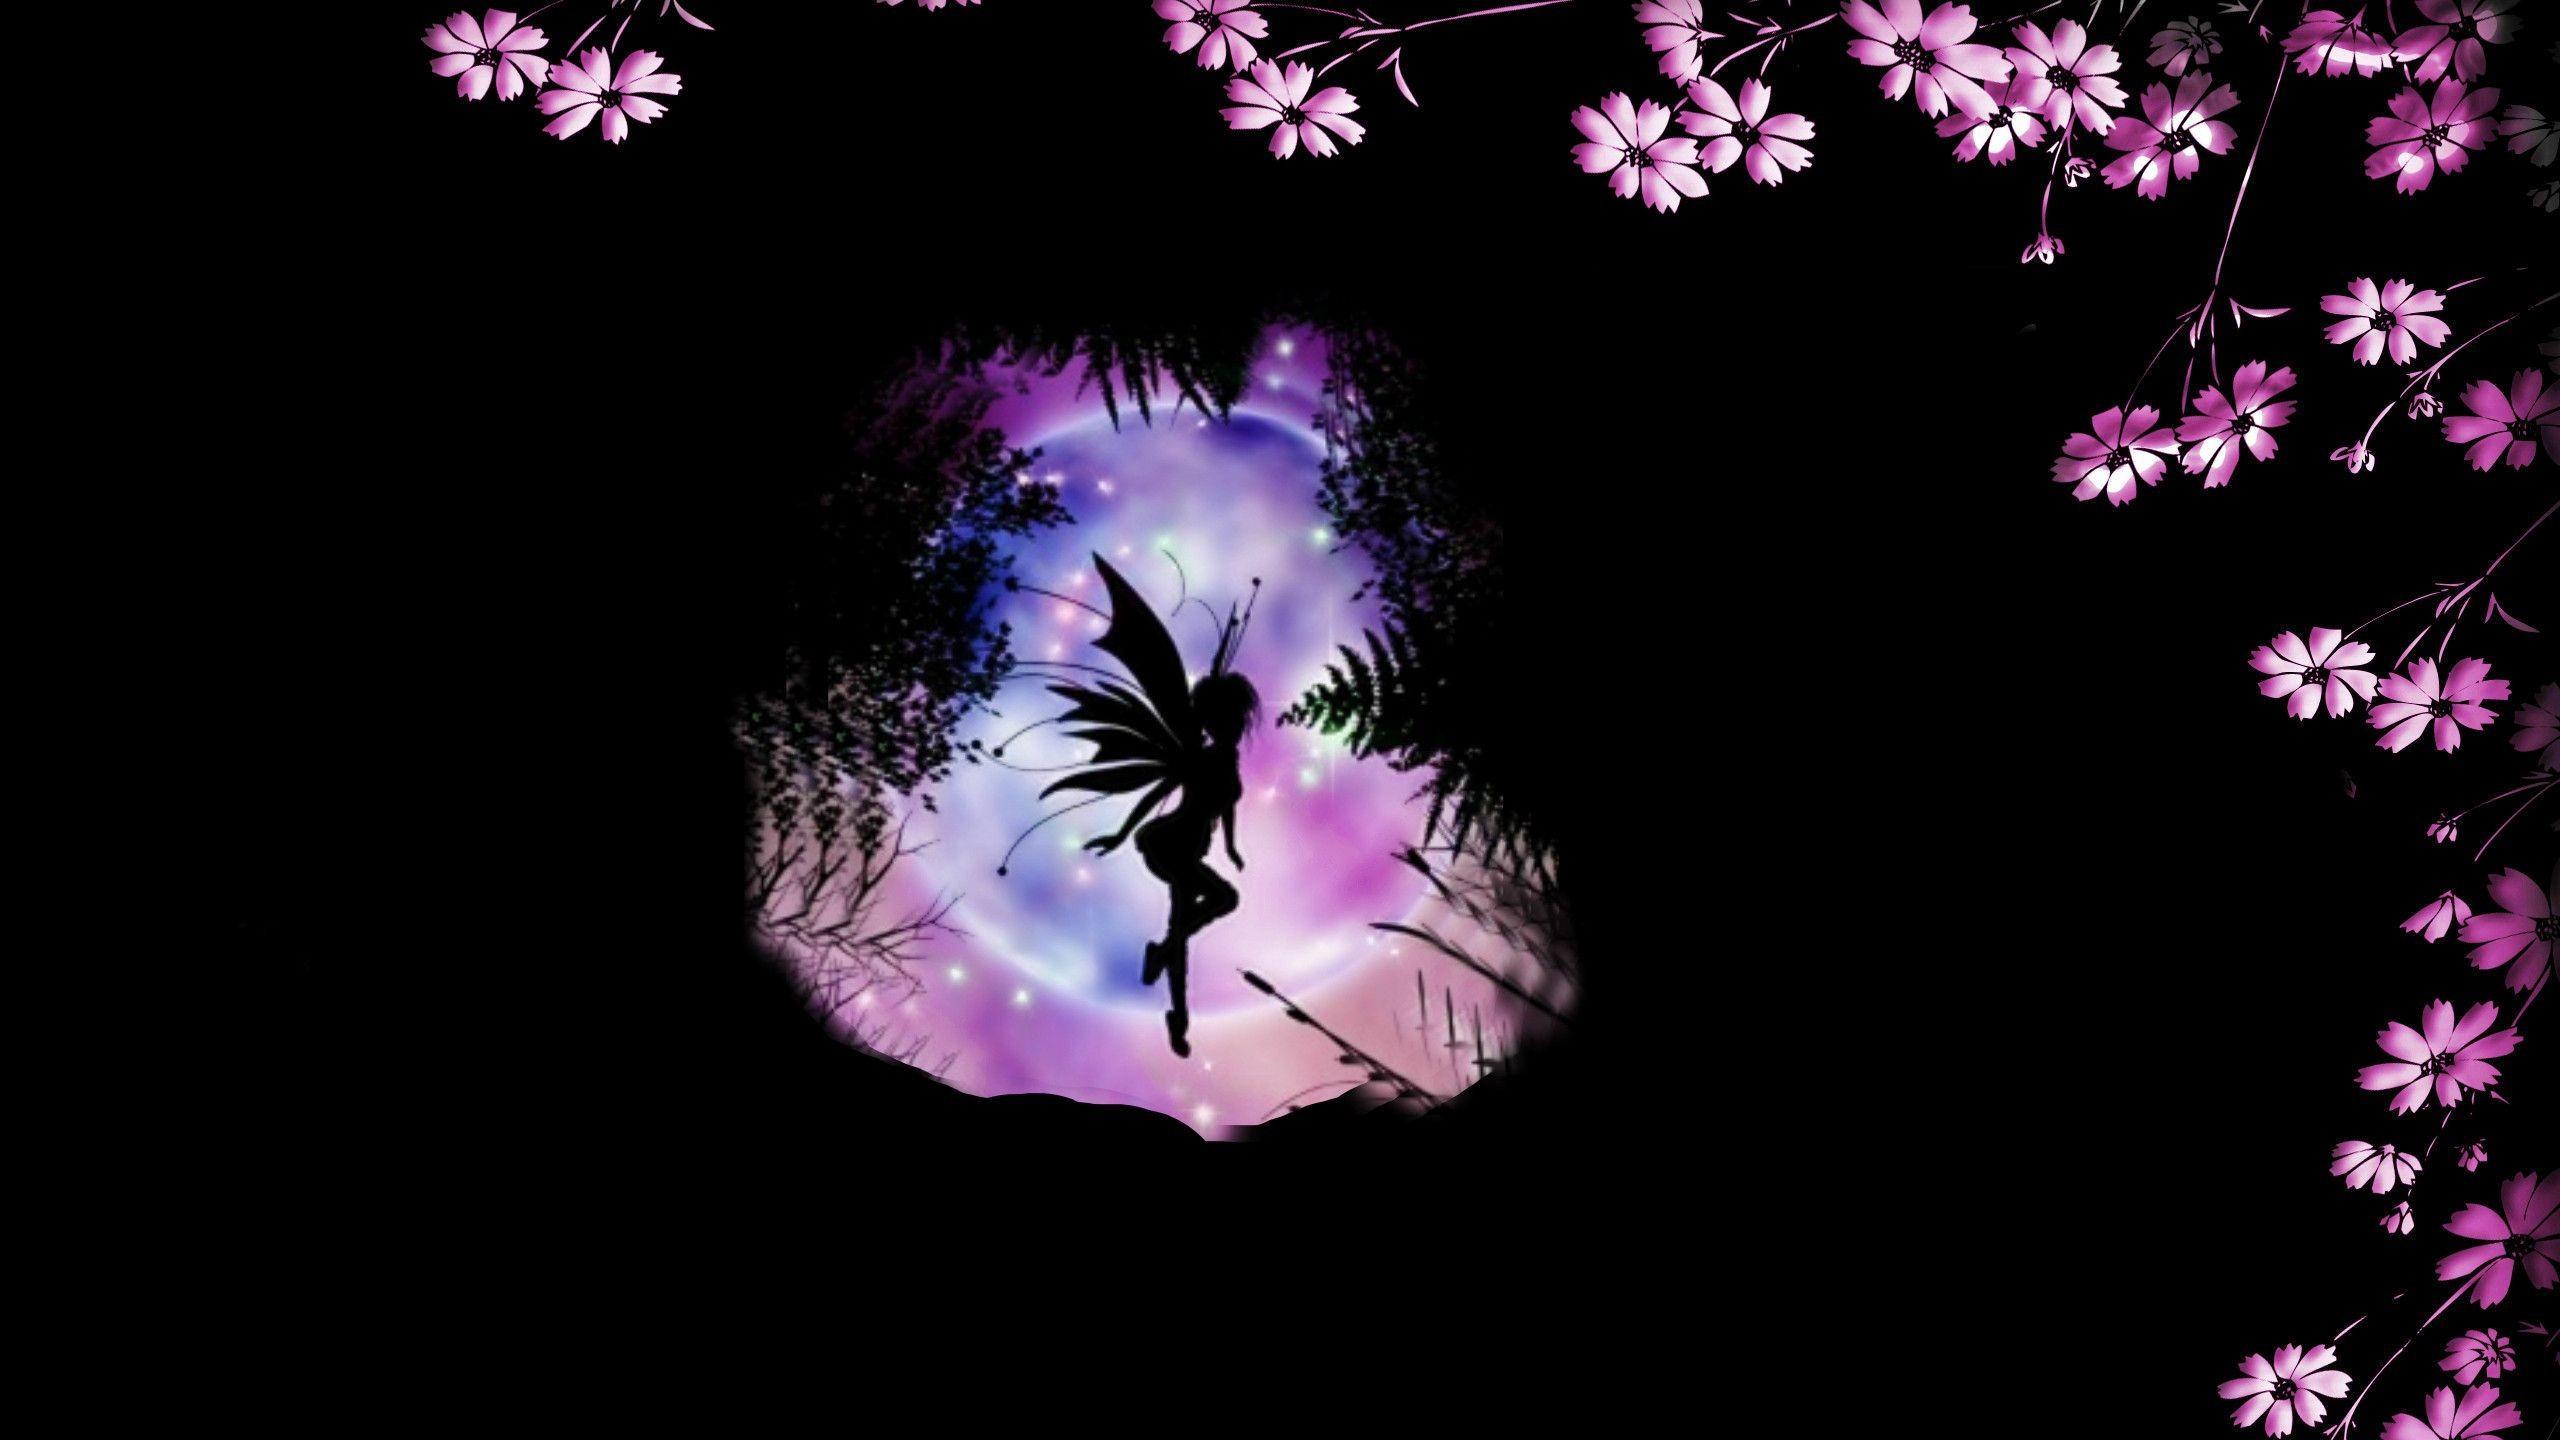 Res: 2560x1440, Fairy Wallpaper Desktop Wallpaper 2560×1440 Fairy Desktop Backgrounds (53  Wallpapers) | Adorable